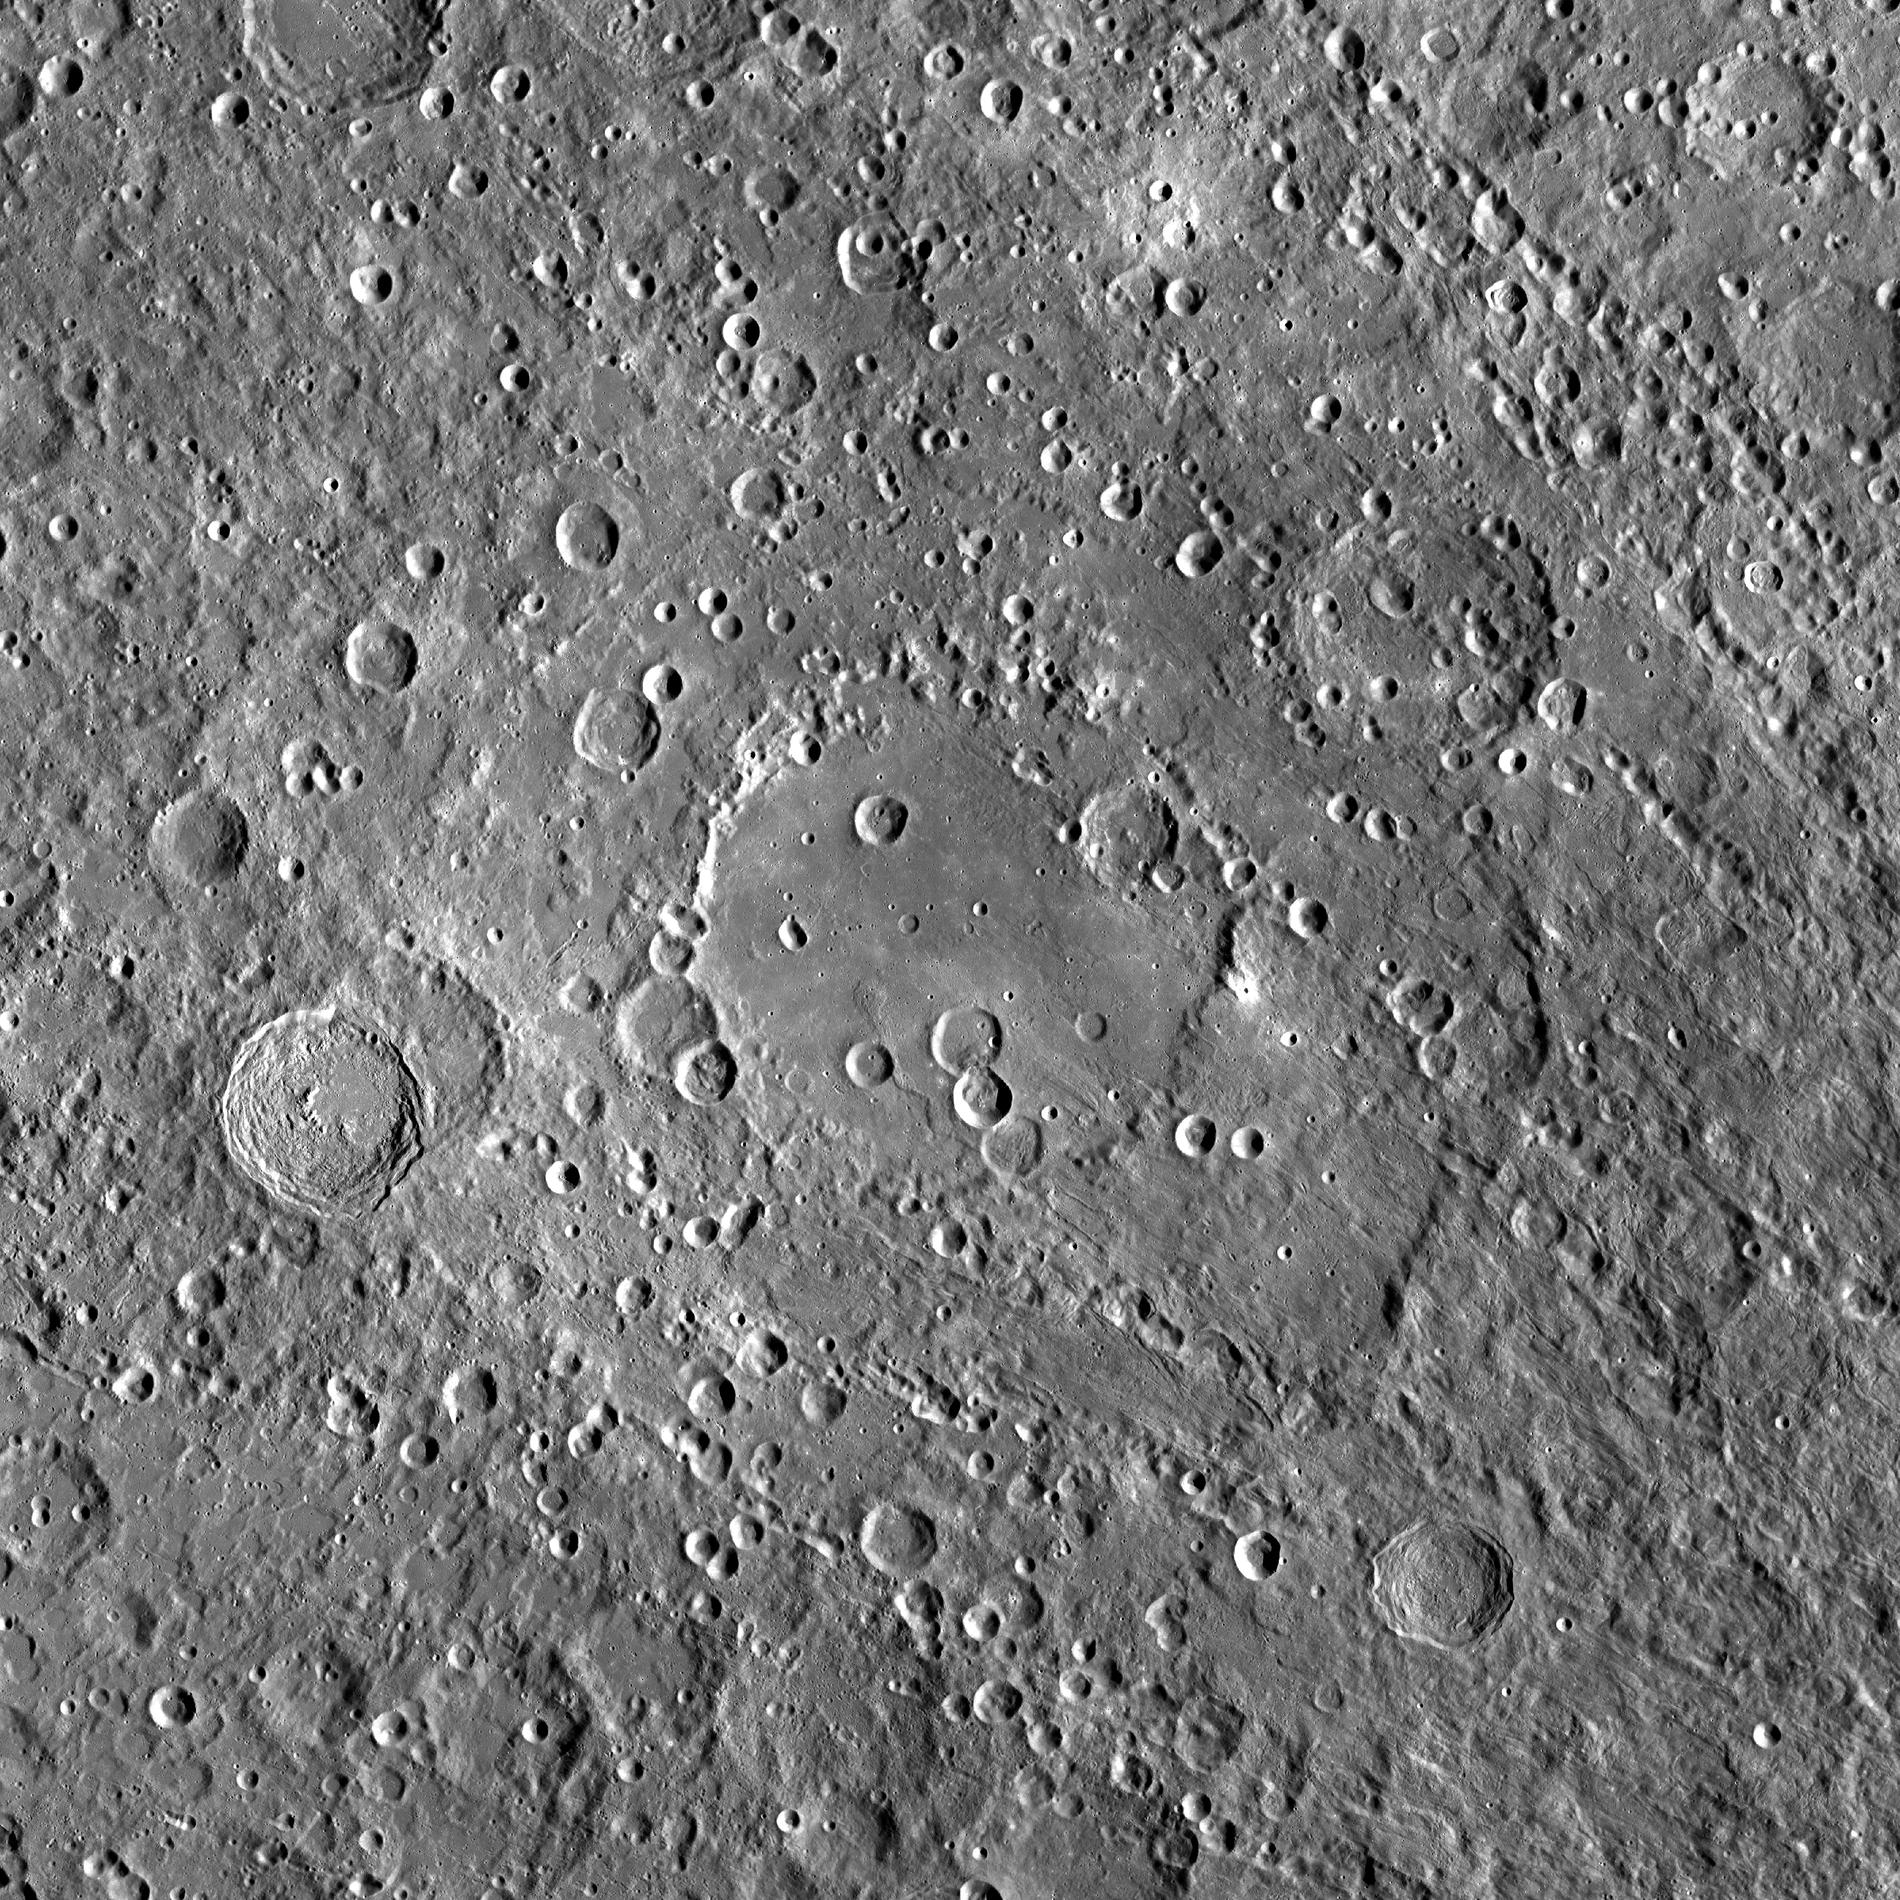 Hertzsprung (LRO).png